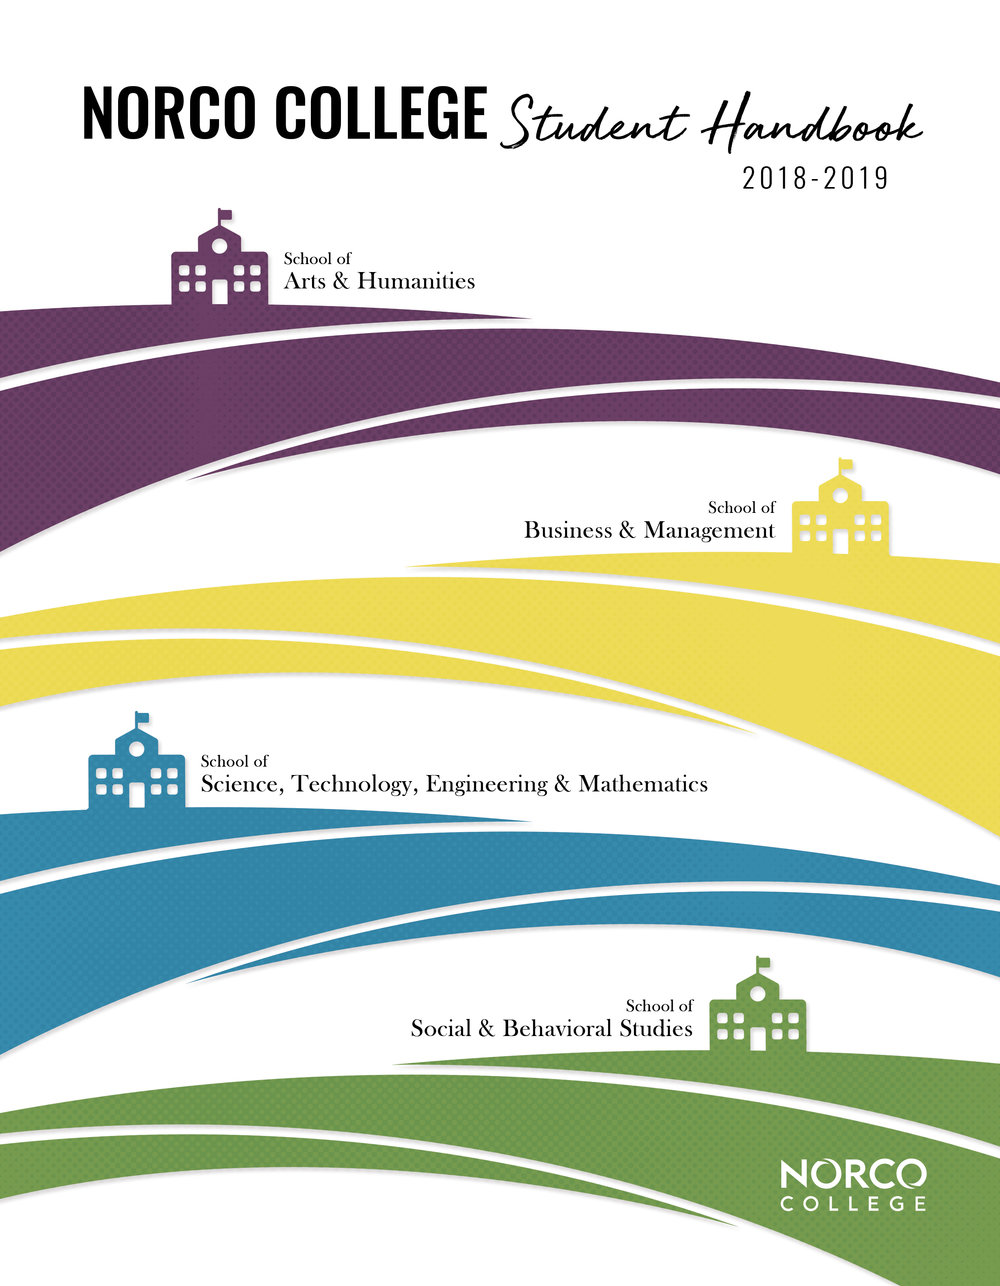 Student Handbook 2018-2019 G.jpg